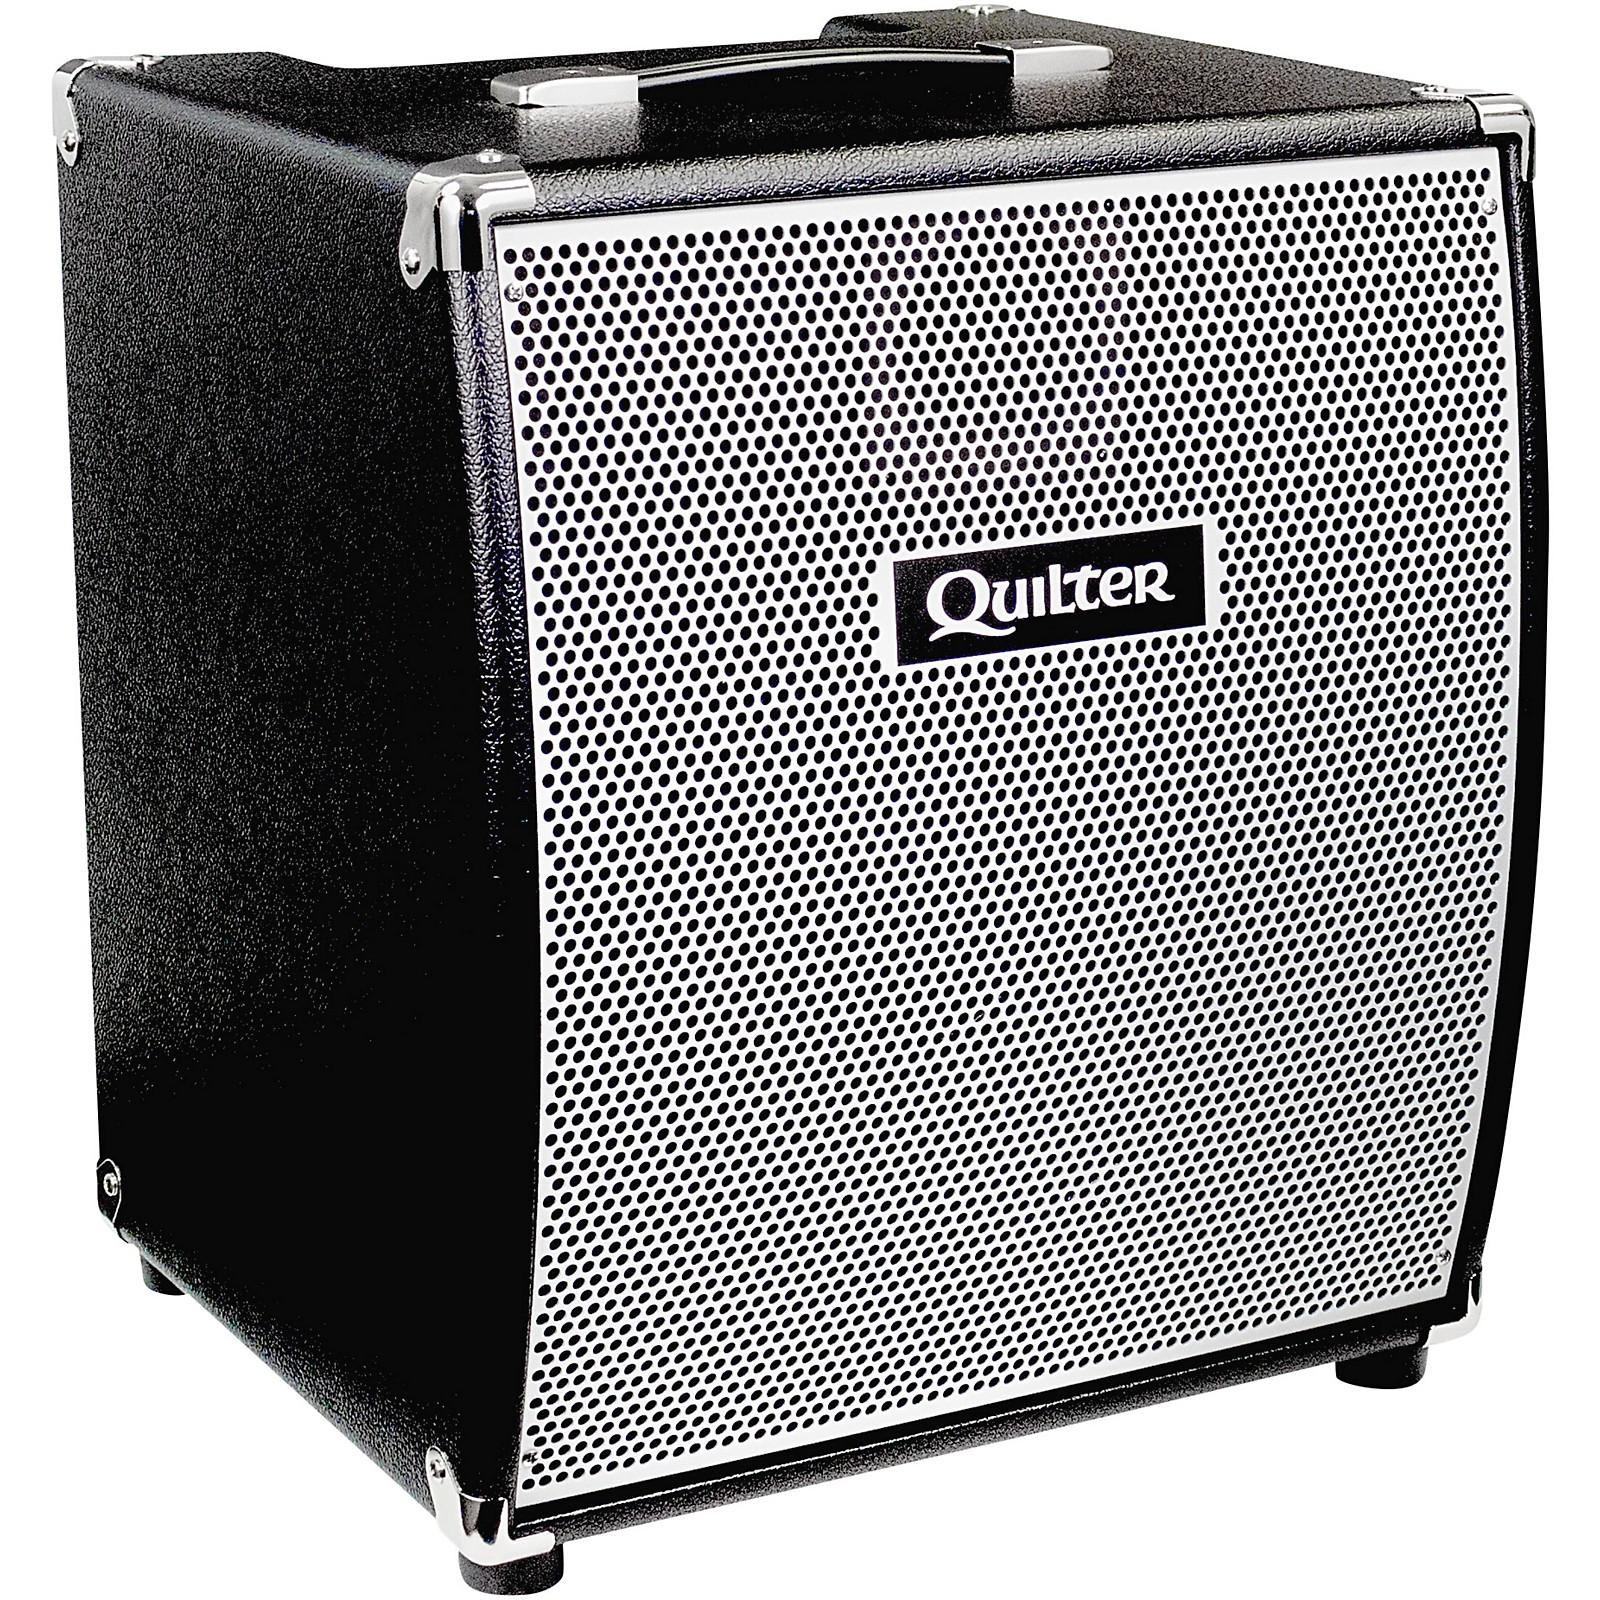 Quilter Labs BassDock BD12 400W 1x12 Bass Speaker Cabinet